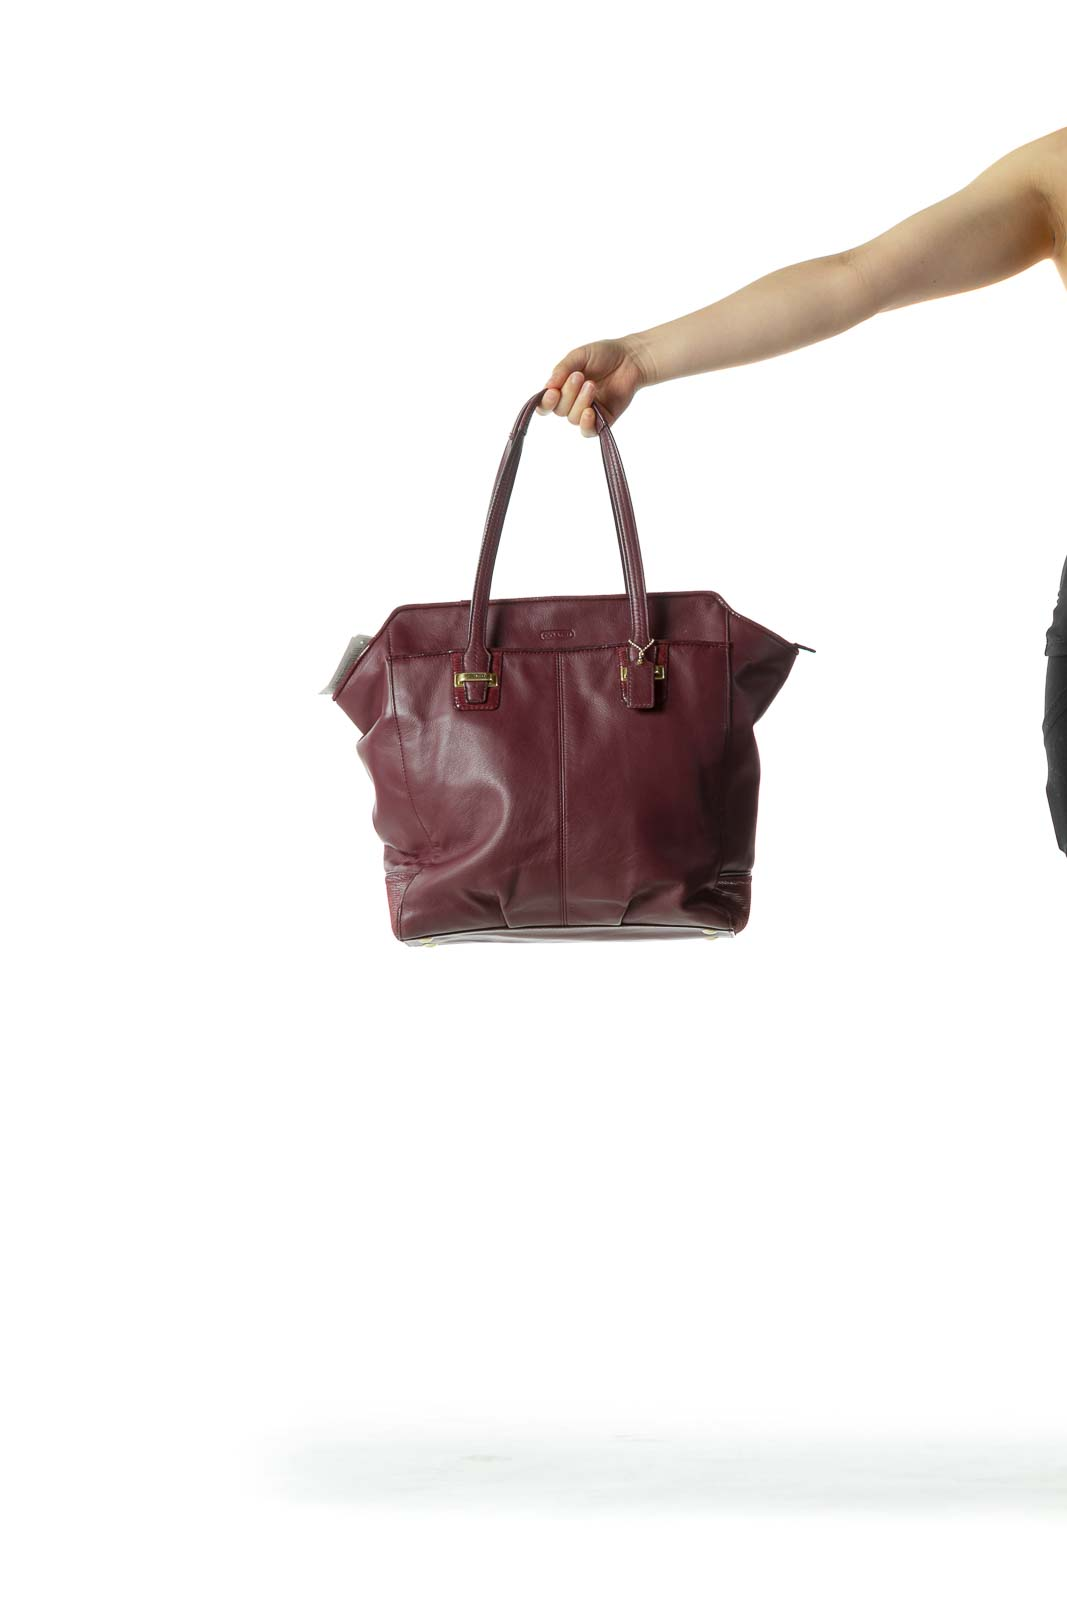 Purple Leather Multi-Pocketed Zippered Shoulder Bag